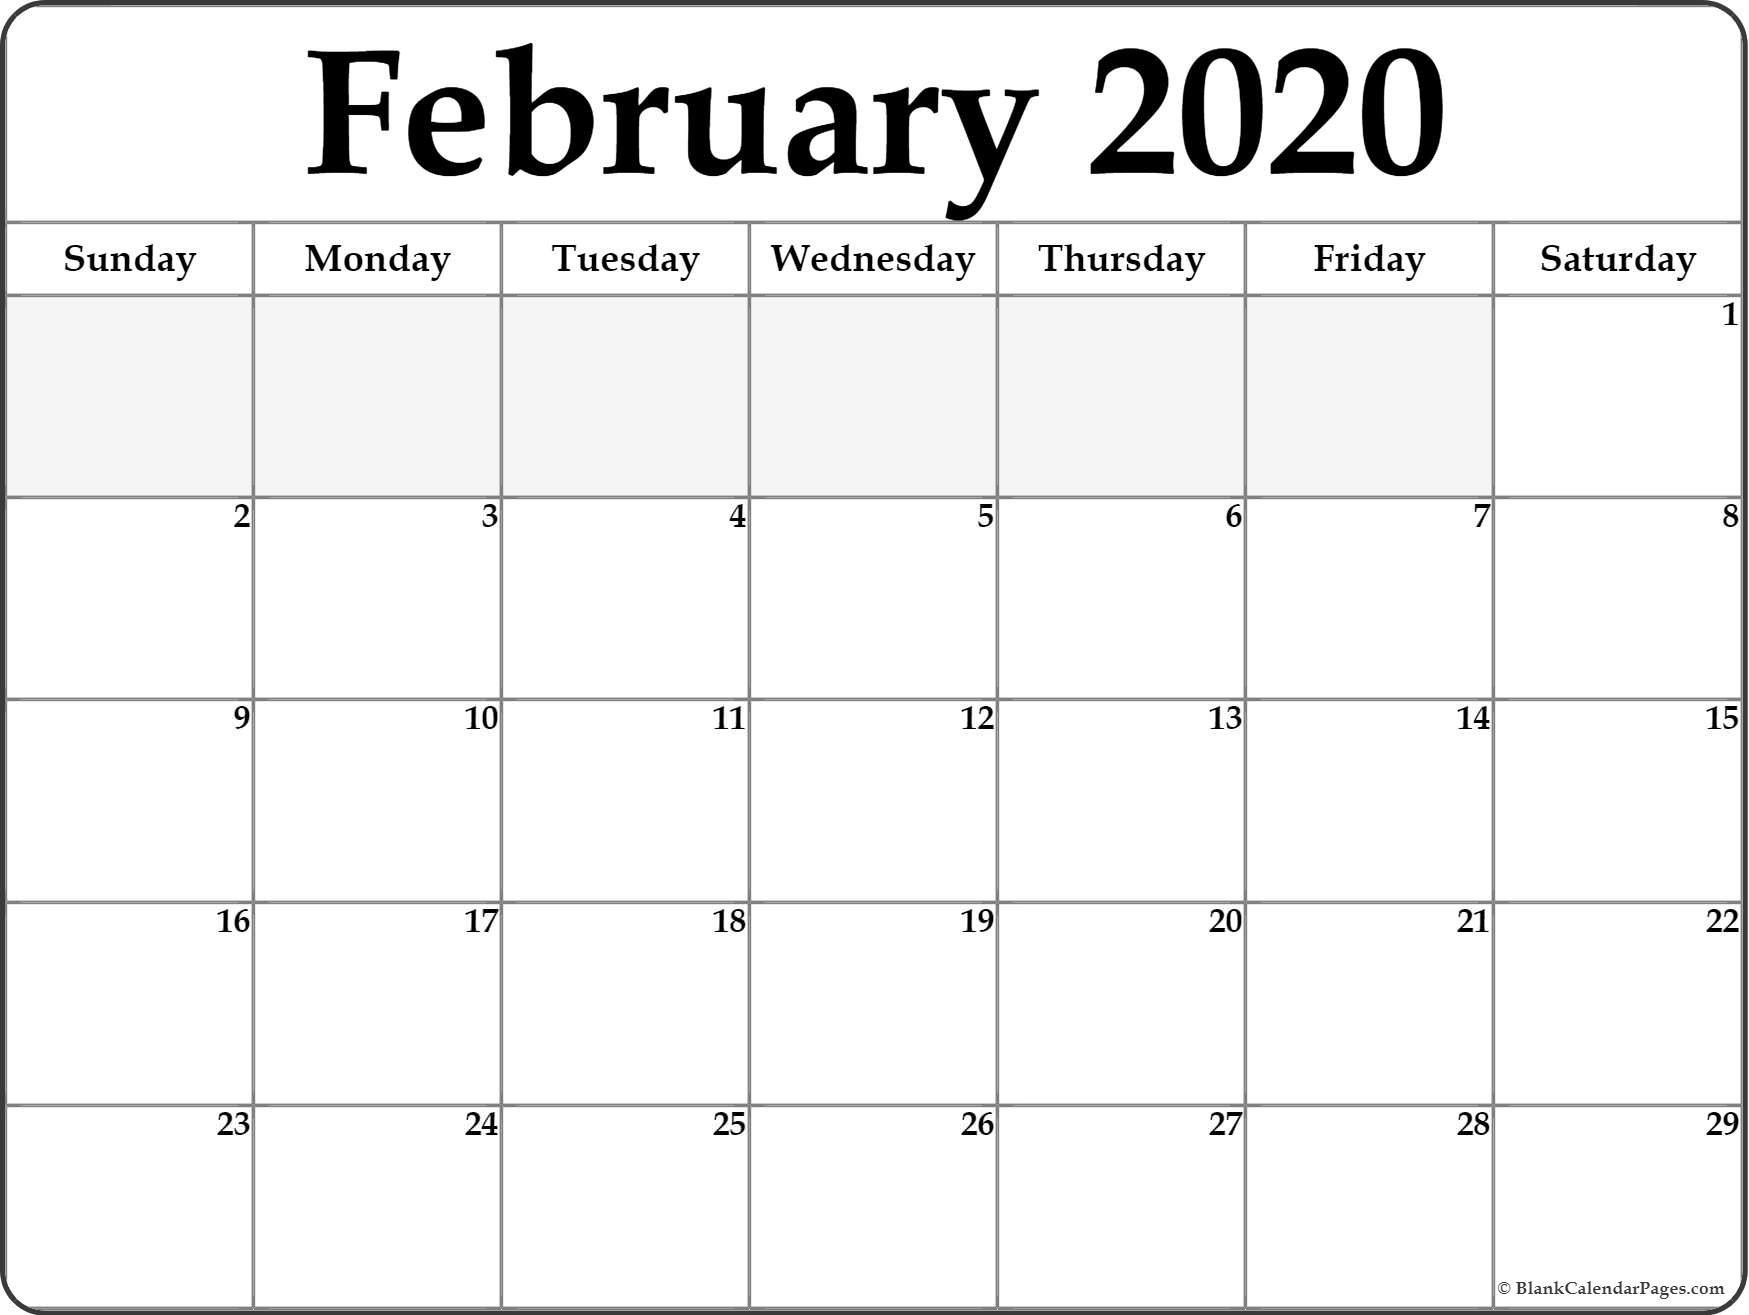 February 2020 Calendar   Free Printable Monthly Calendars Fill In A Calendar